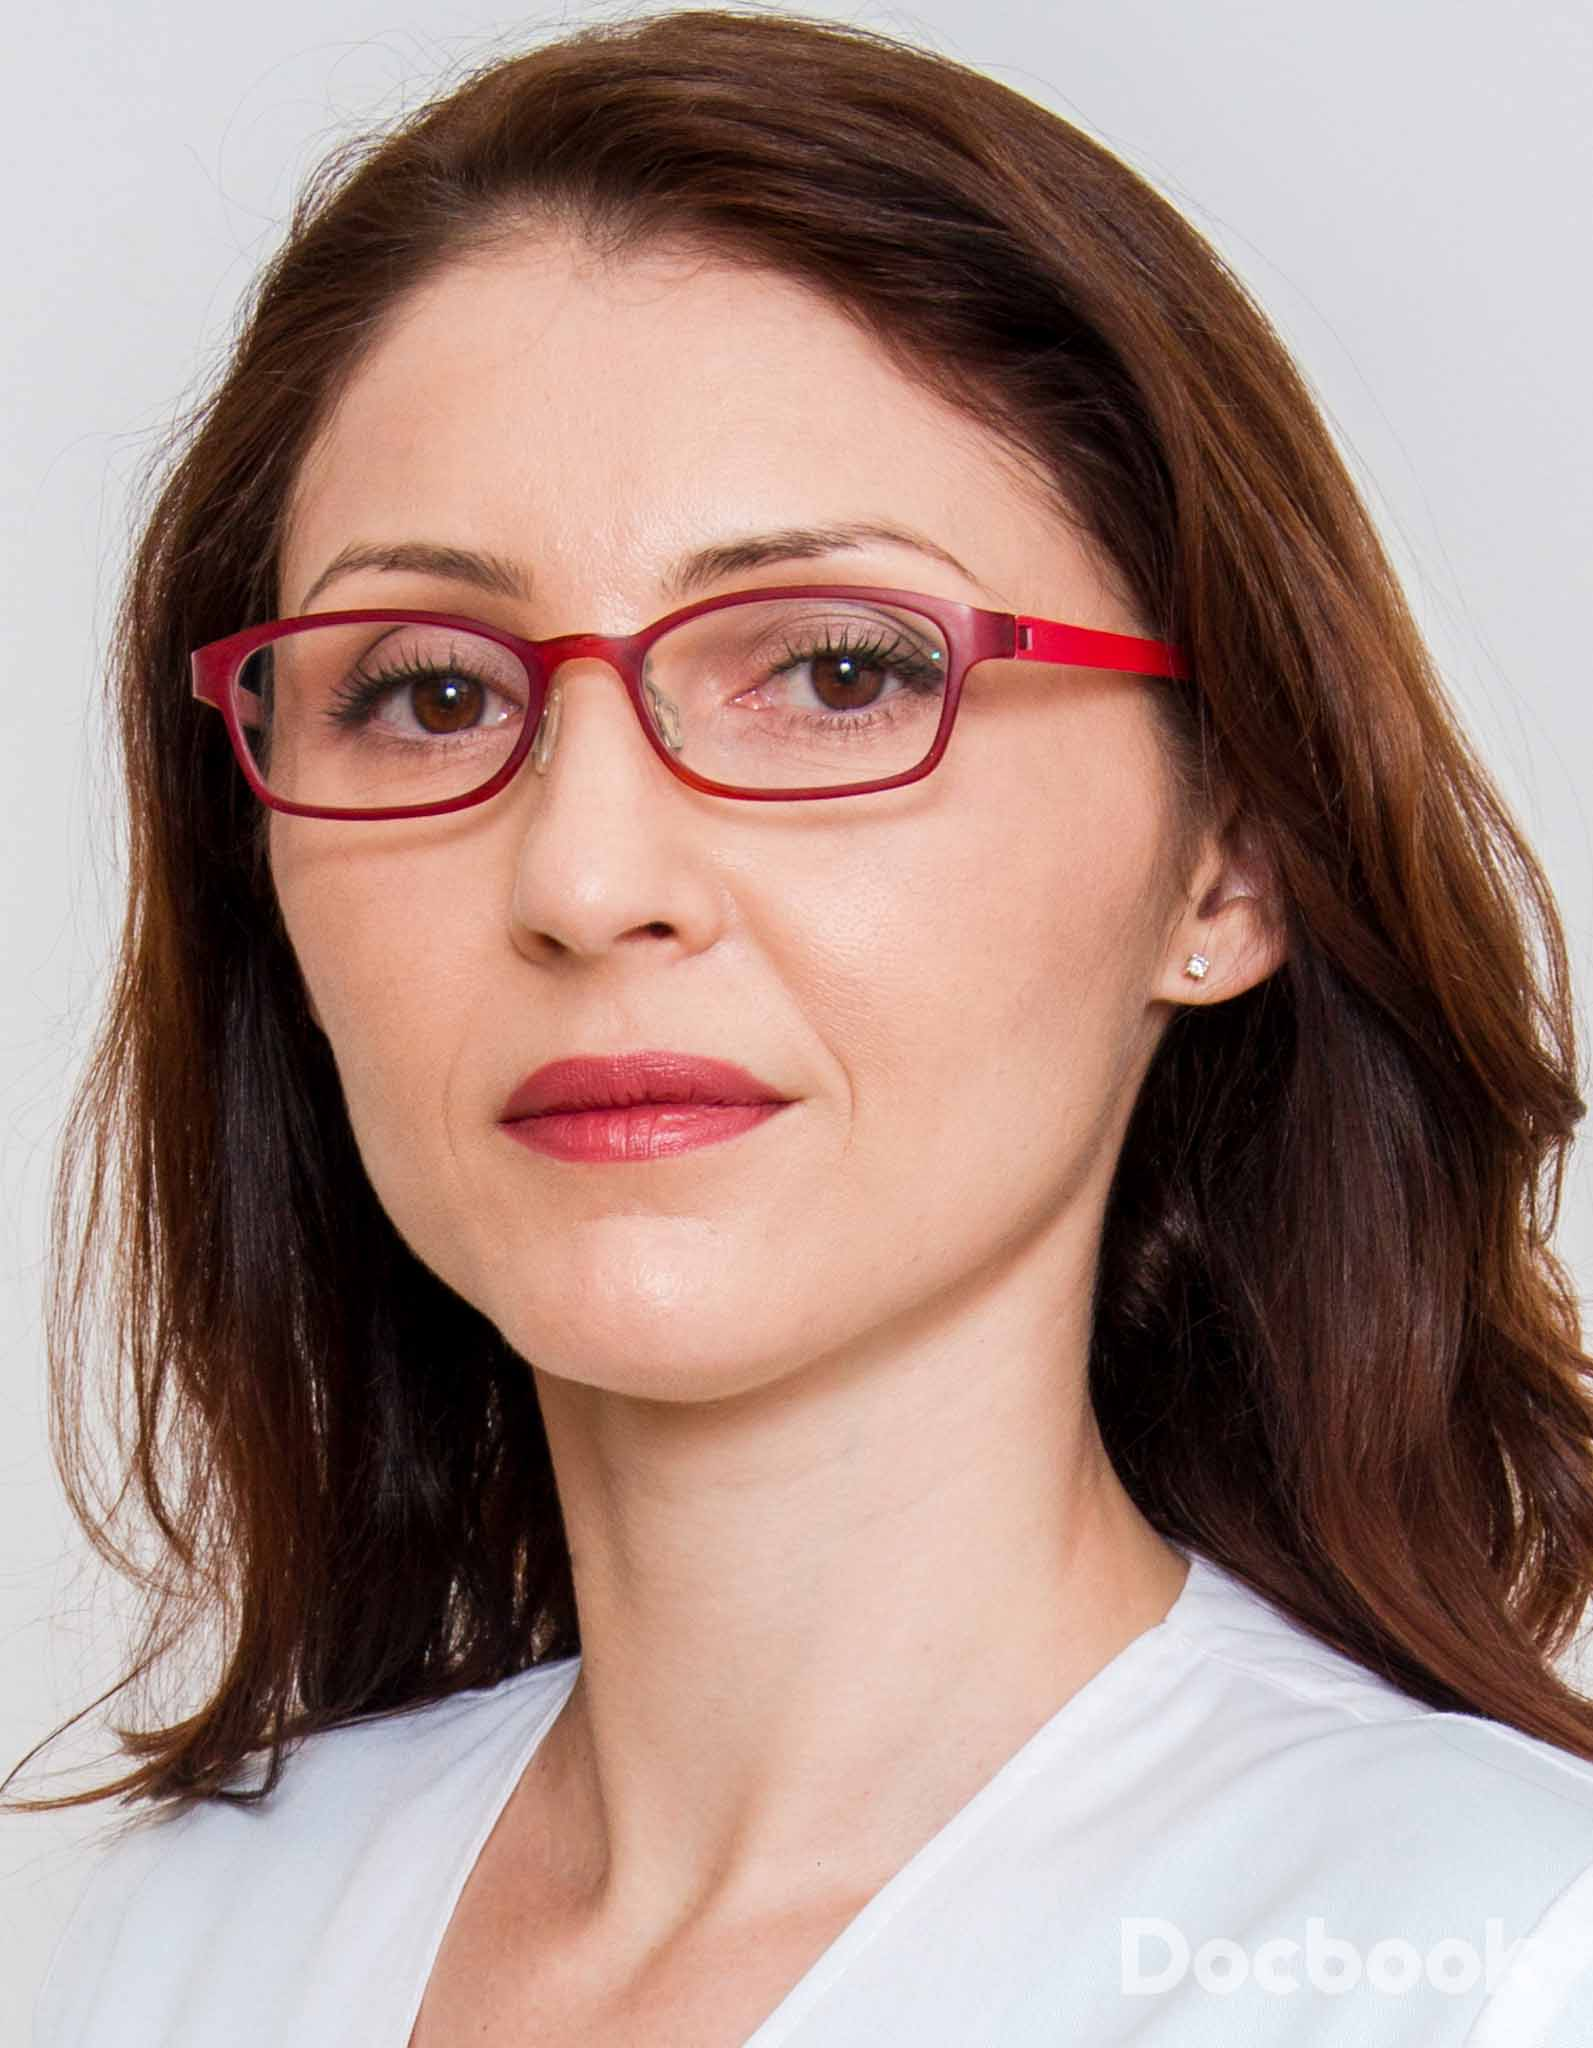 Dr. Emanuela Raluca Soare